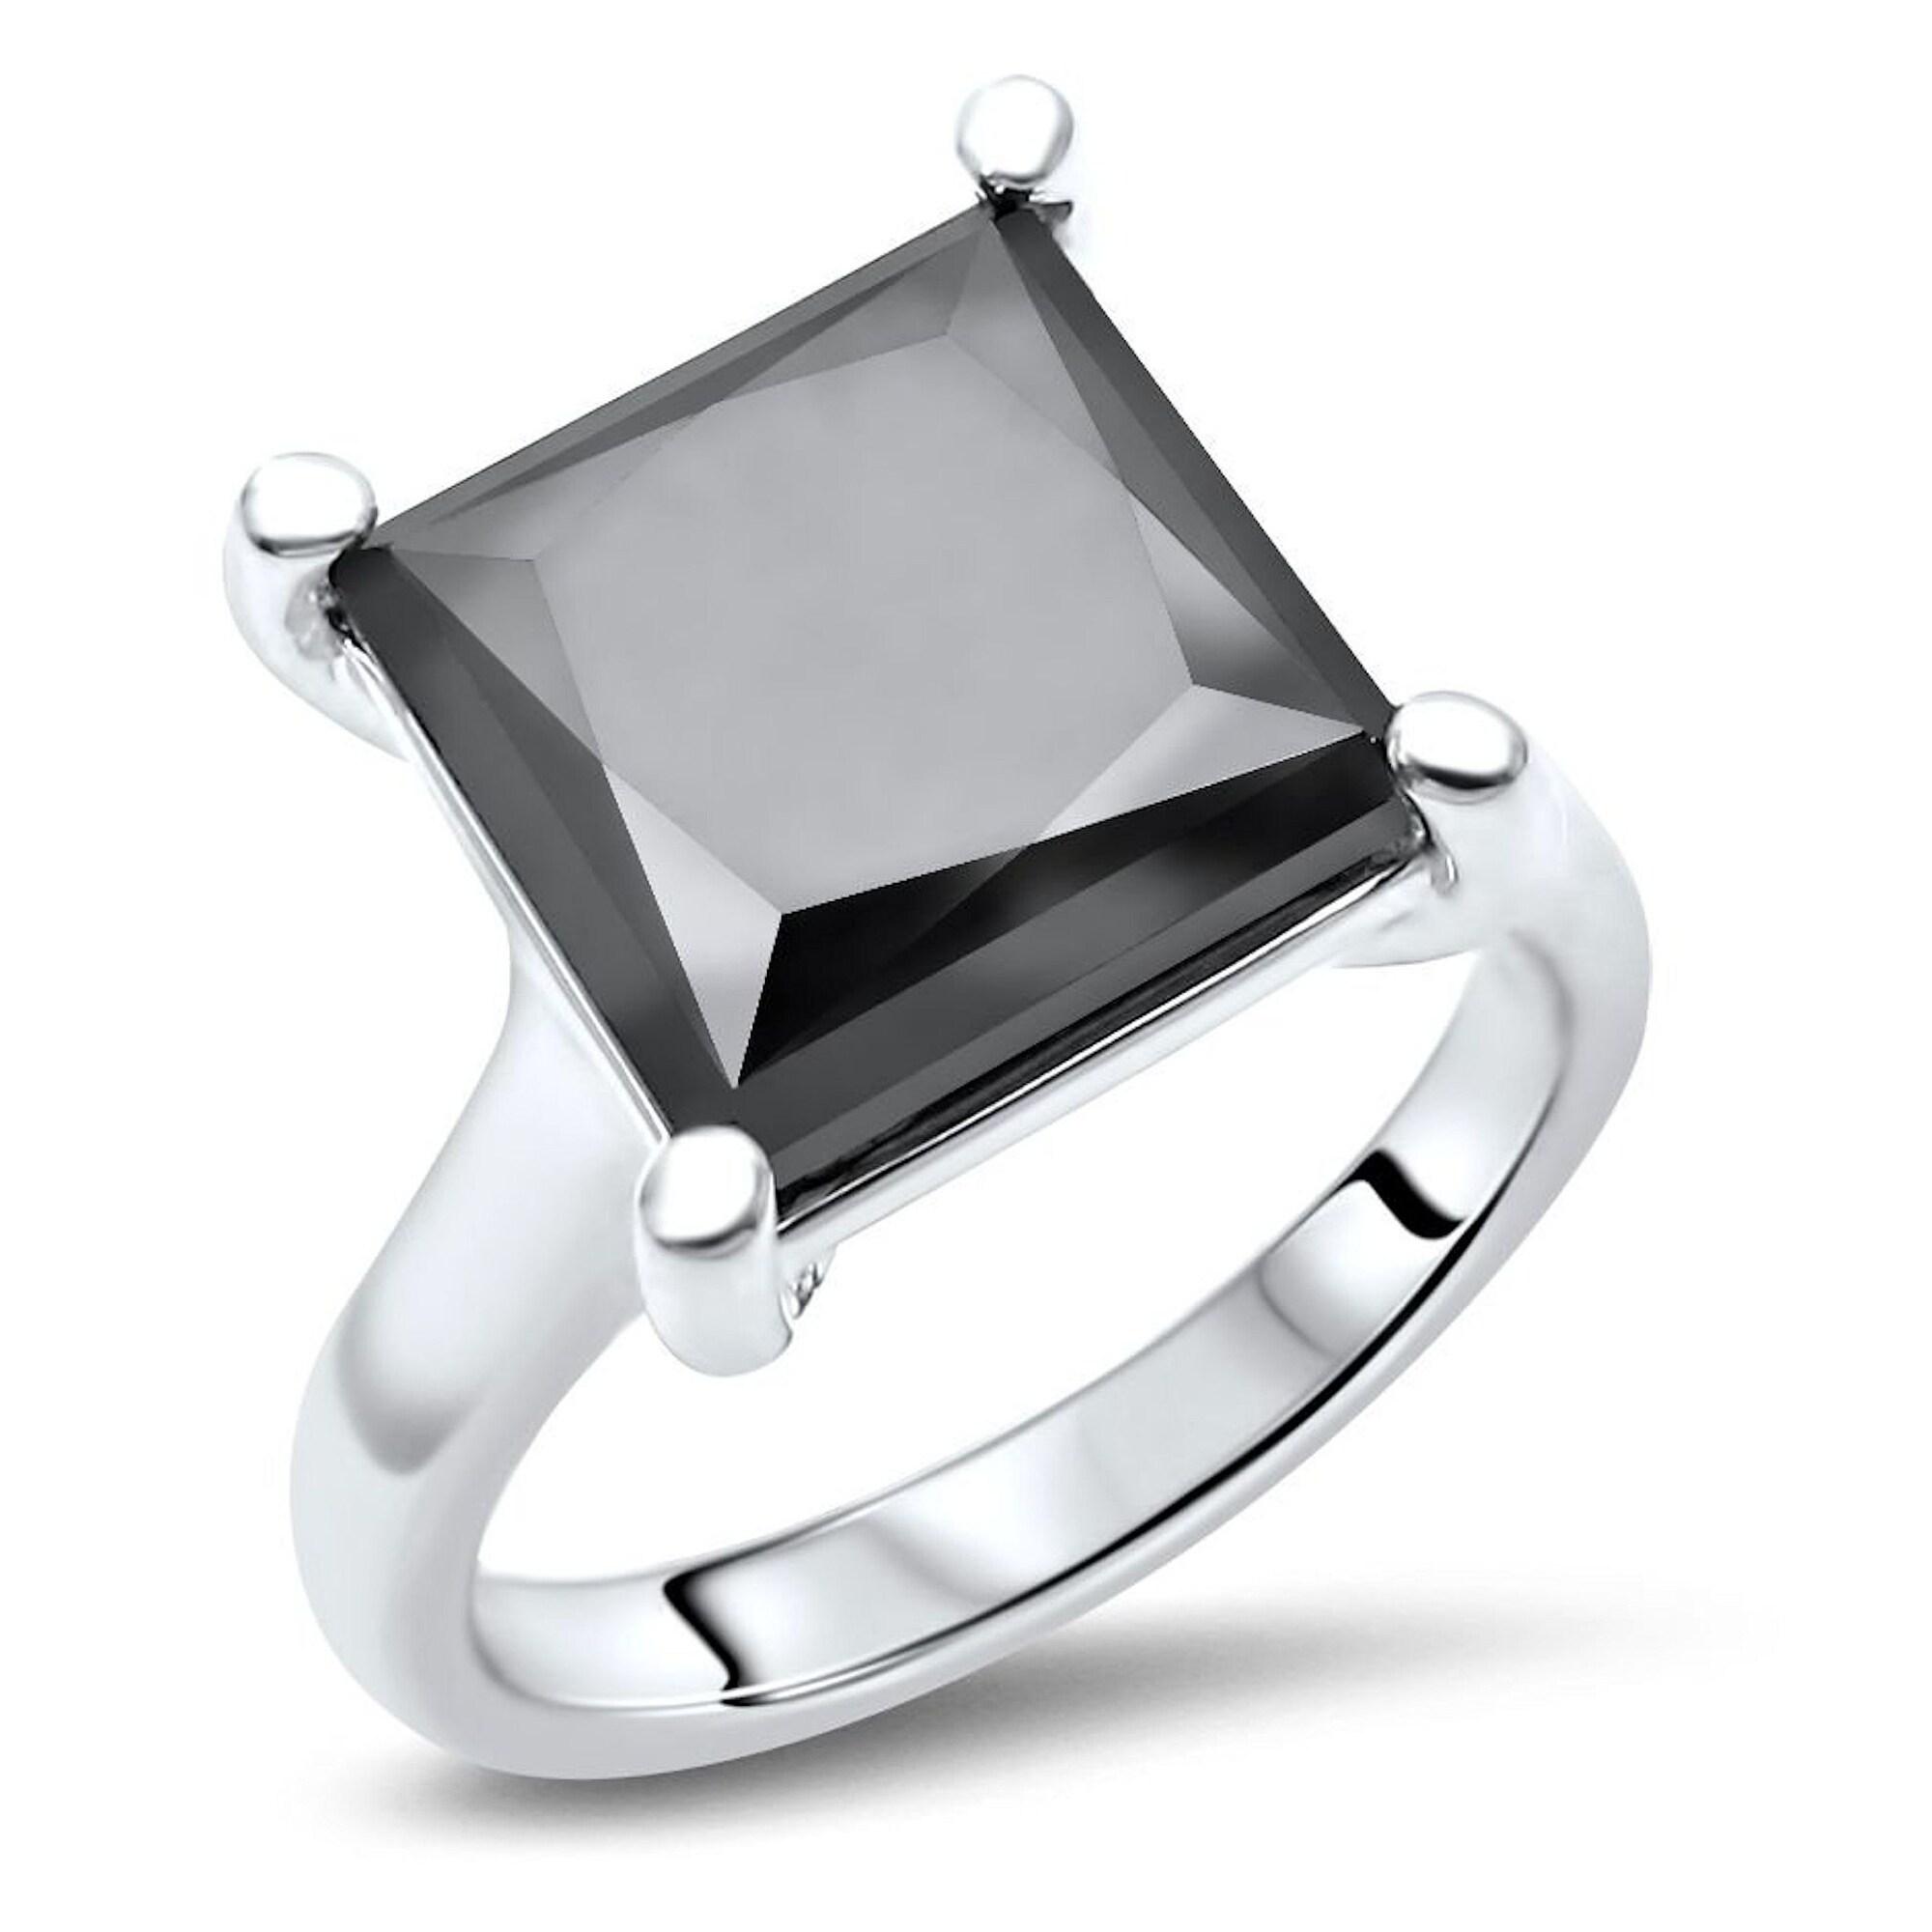 5.15 Ct Round Cut Diamond Engagement Wedding Ring Set 14K Real White Gold Over